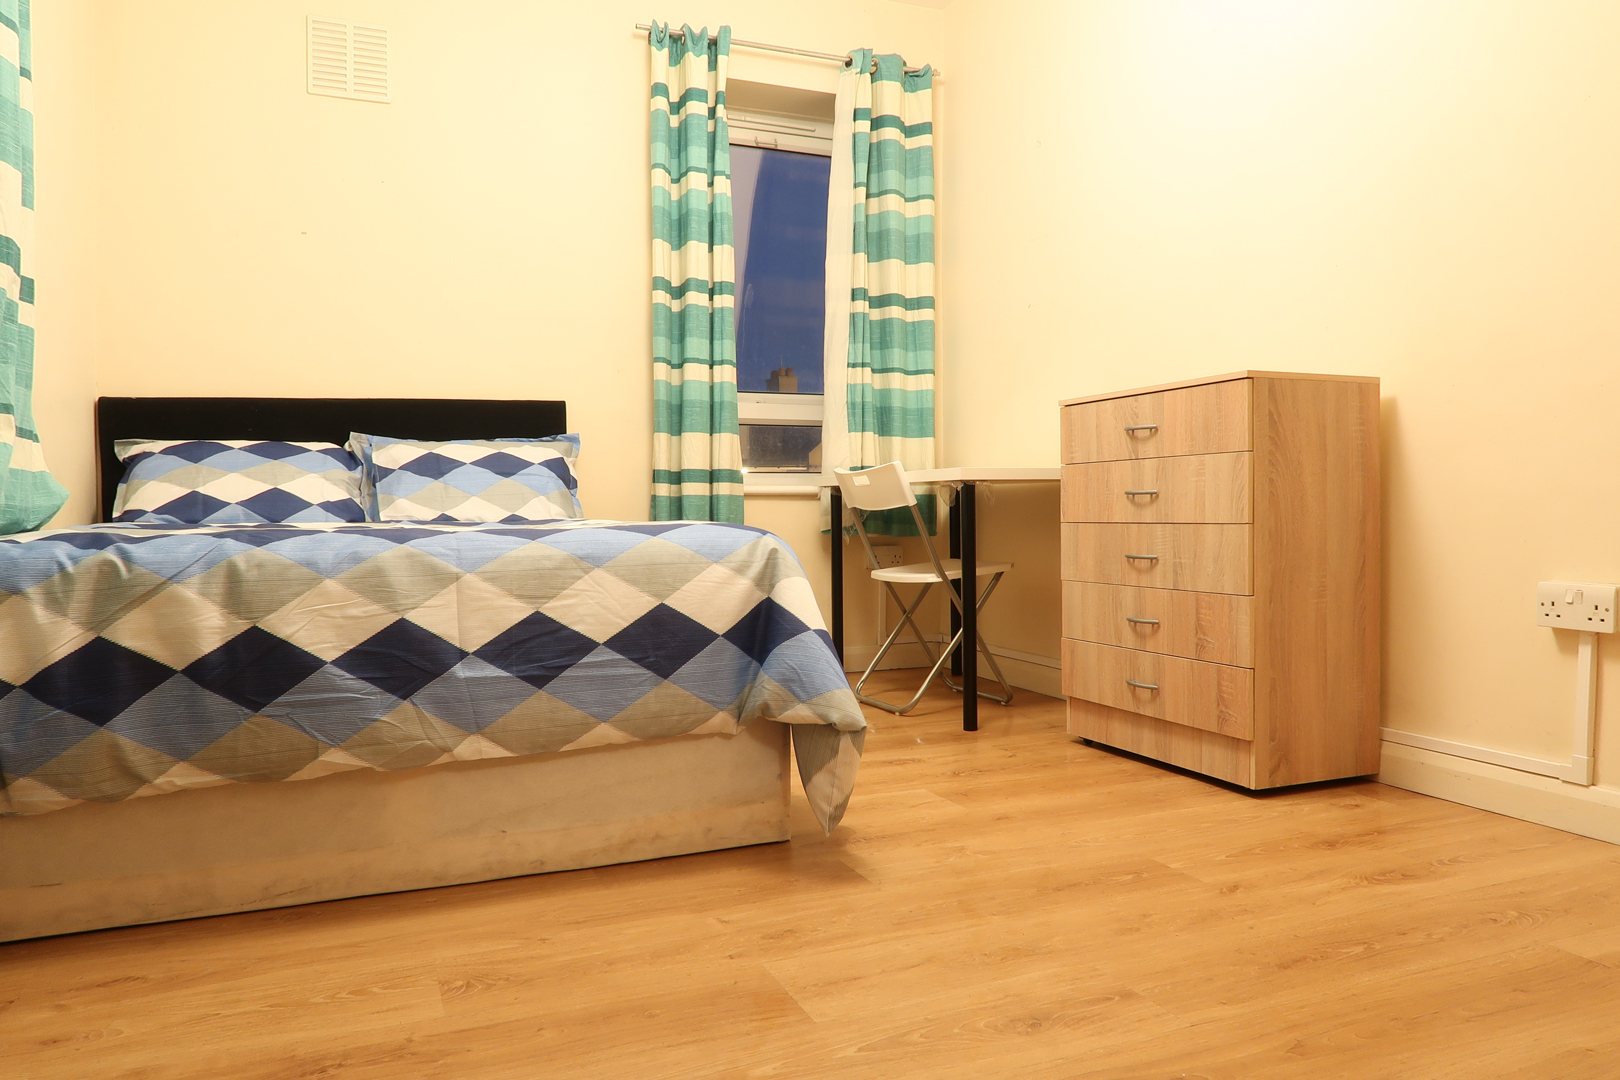 Apartment LIMBOROUGH HOUSE - DELUXE GUEST ROOM 4 photo 20296218